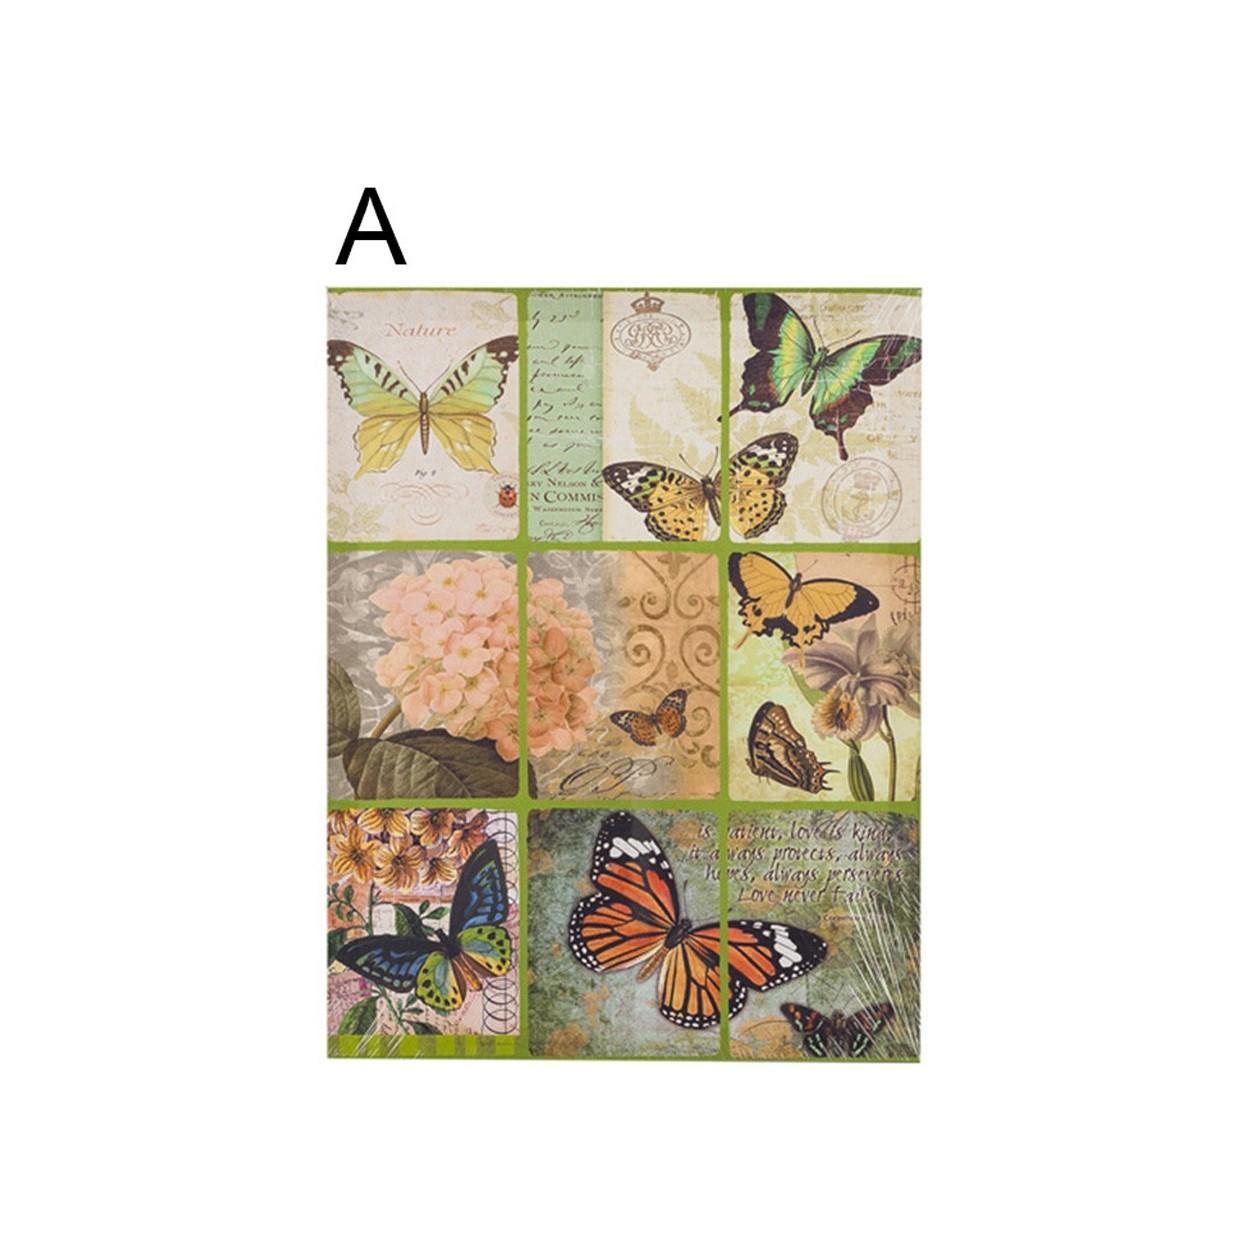 comprar cuadro mariposas 40 x 50 cm hogar y m s. Black Bedroom Furniture Sets. Home Design Ideas